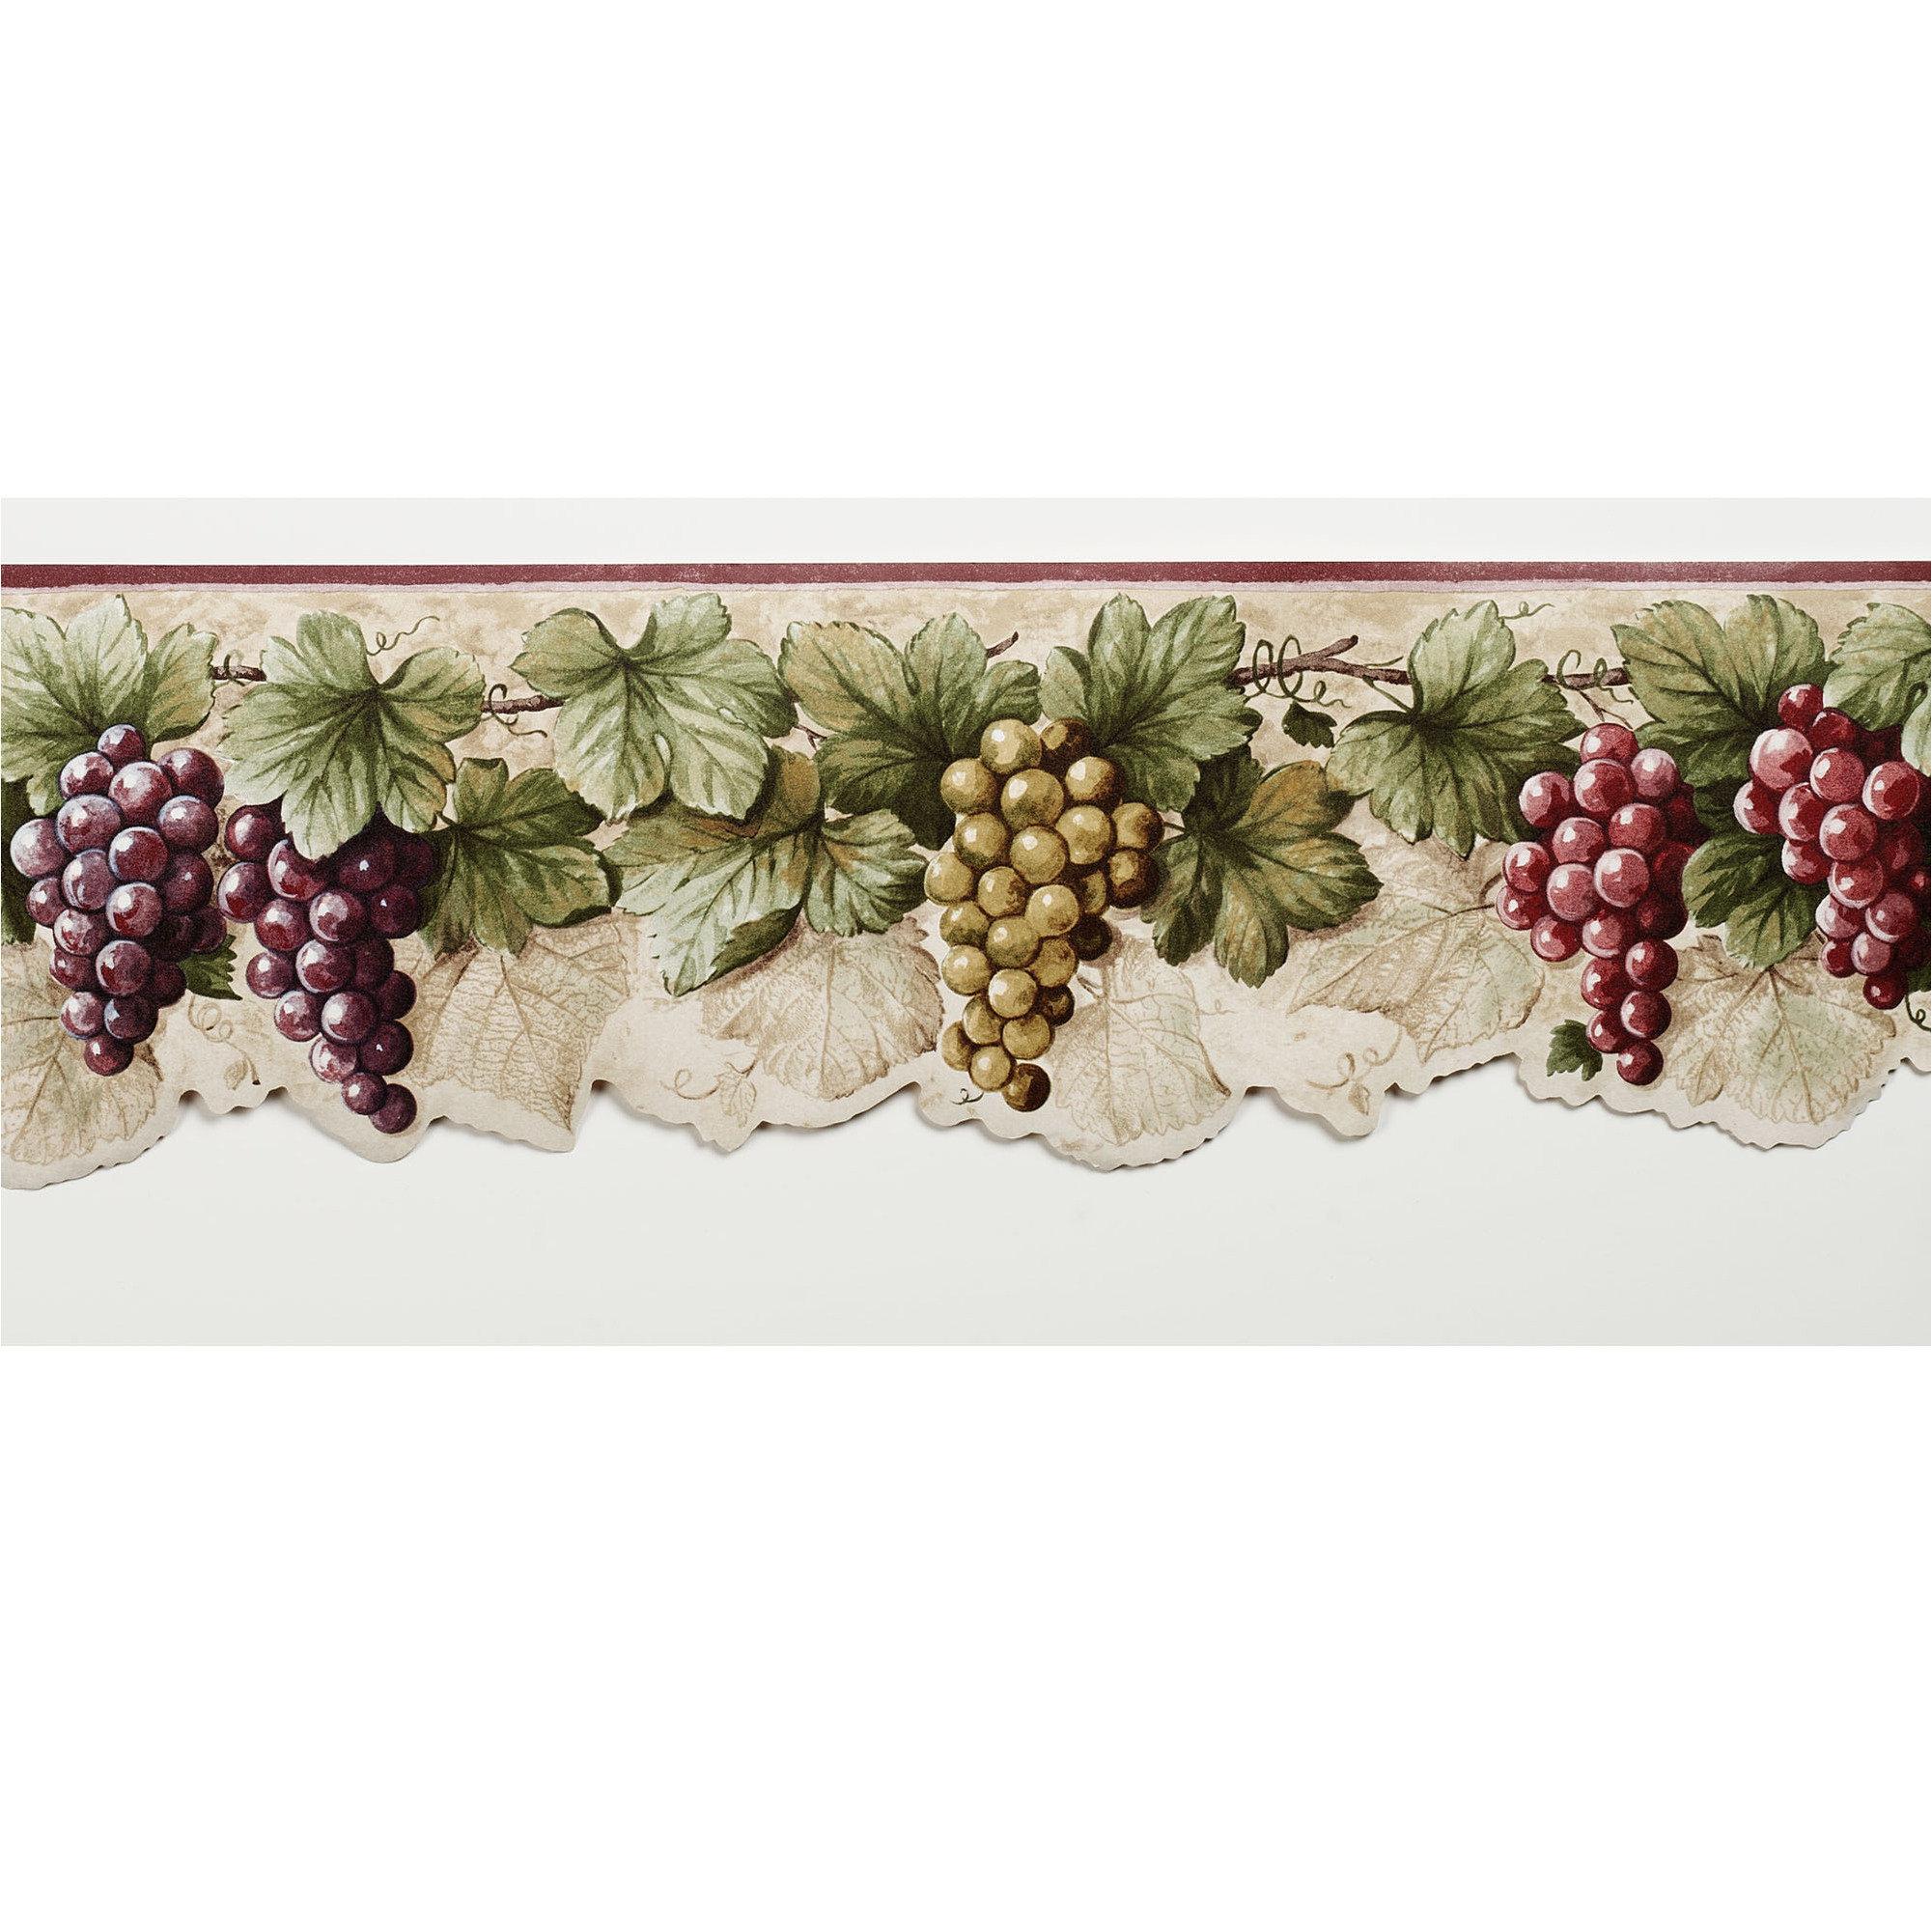 Wallpaper Border titleHome Harvest Time Grapes Wallpaper 2001x2000